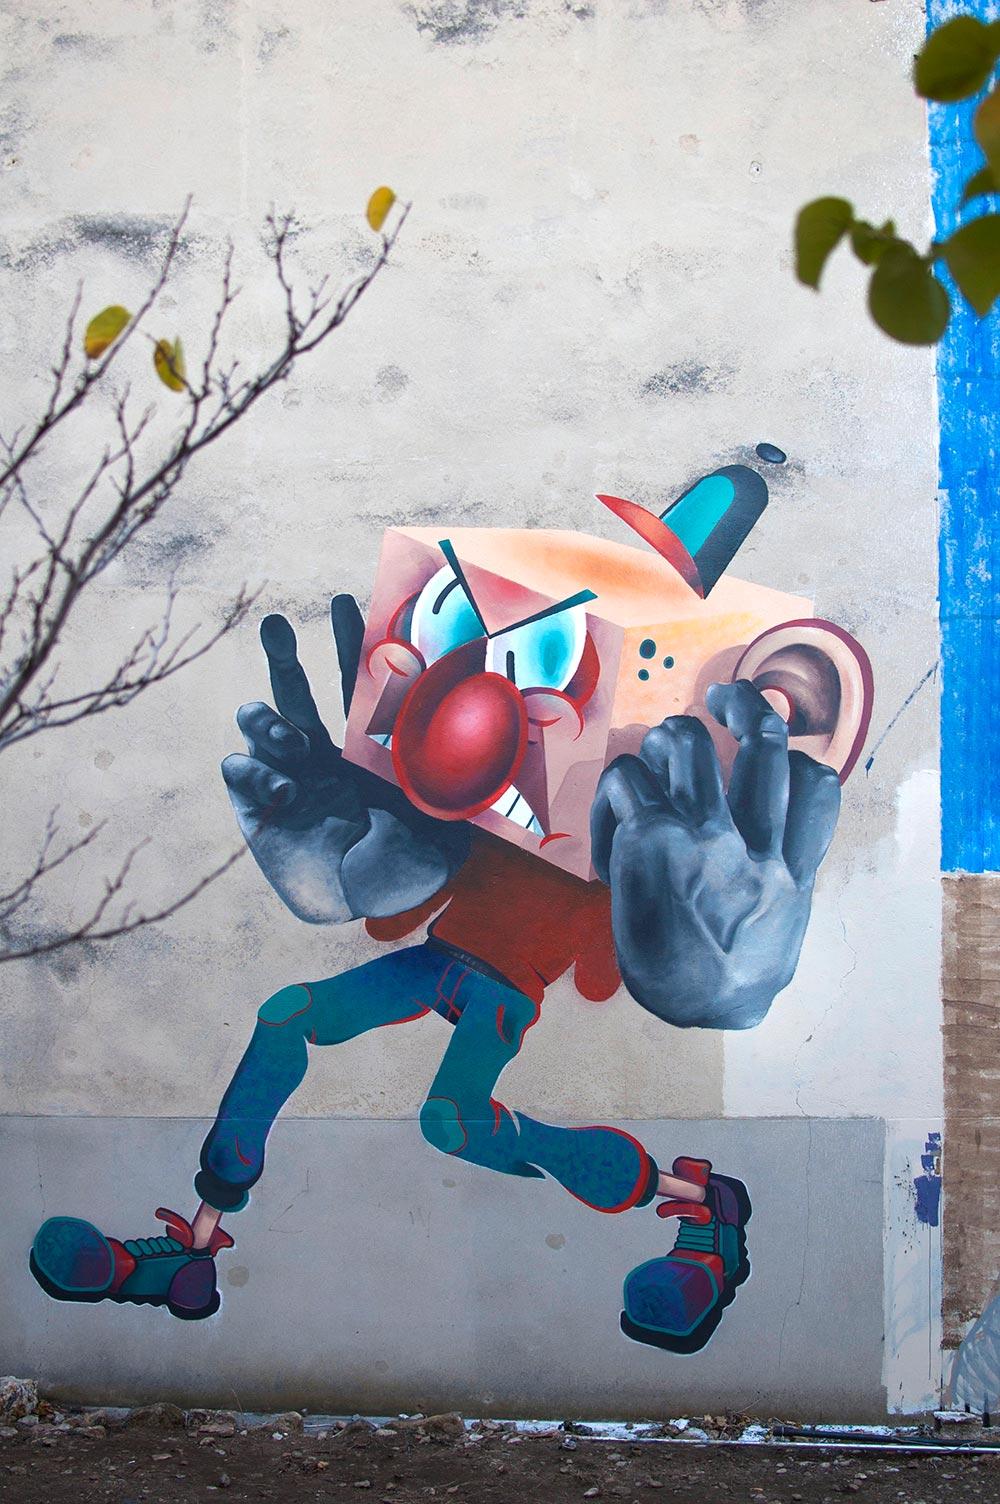 nefrit artist graffiti fresque peinture peintre street art